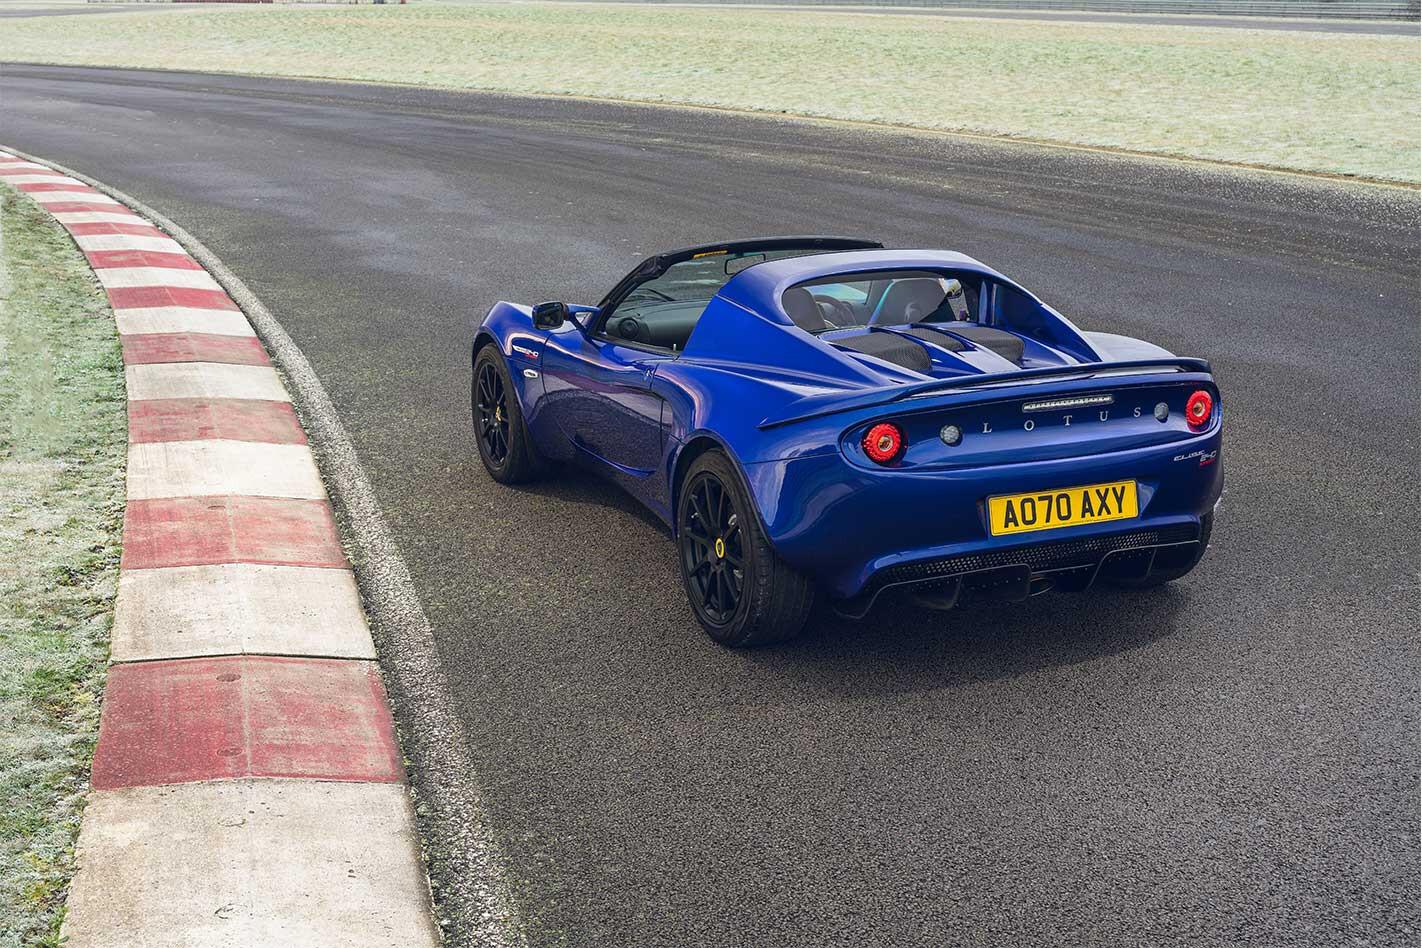 Lotus Elise and Exige Final Edition ranges arrive